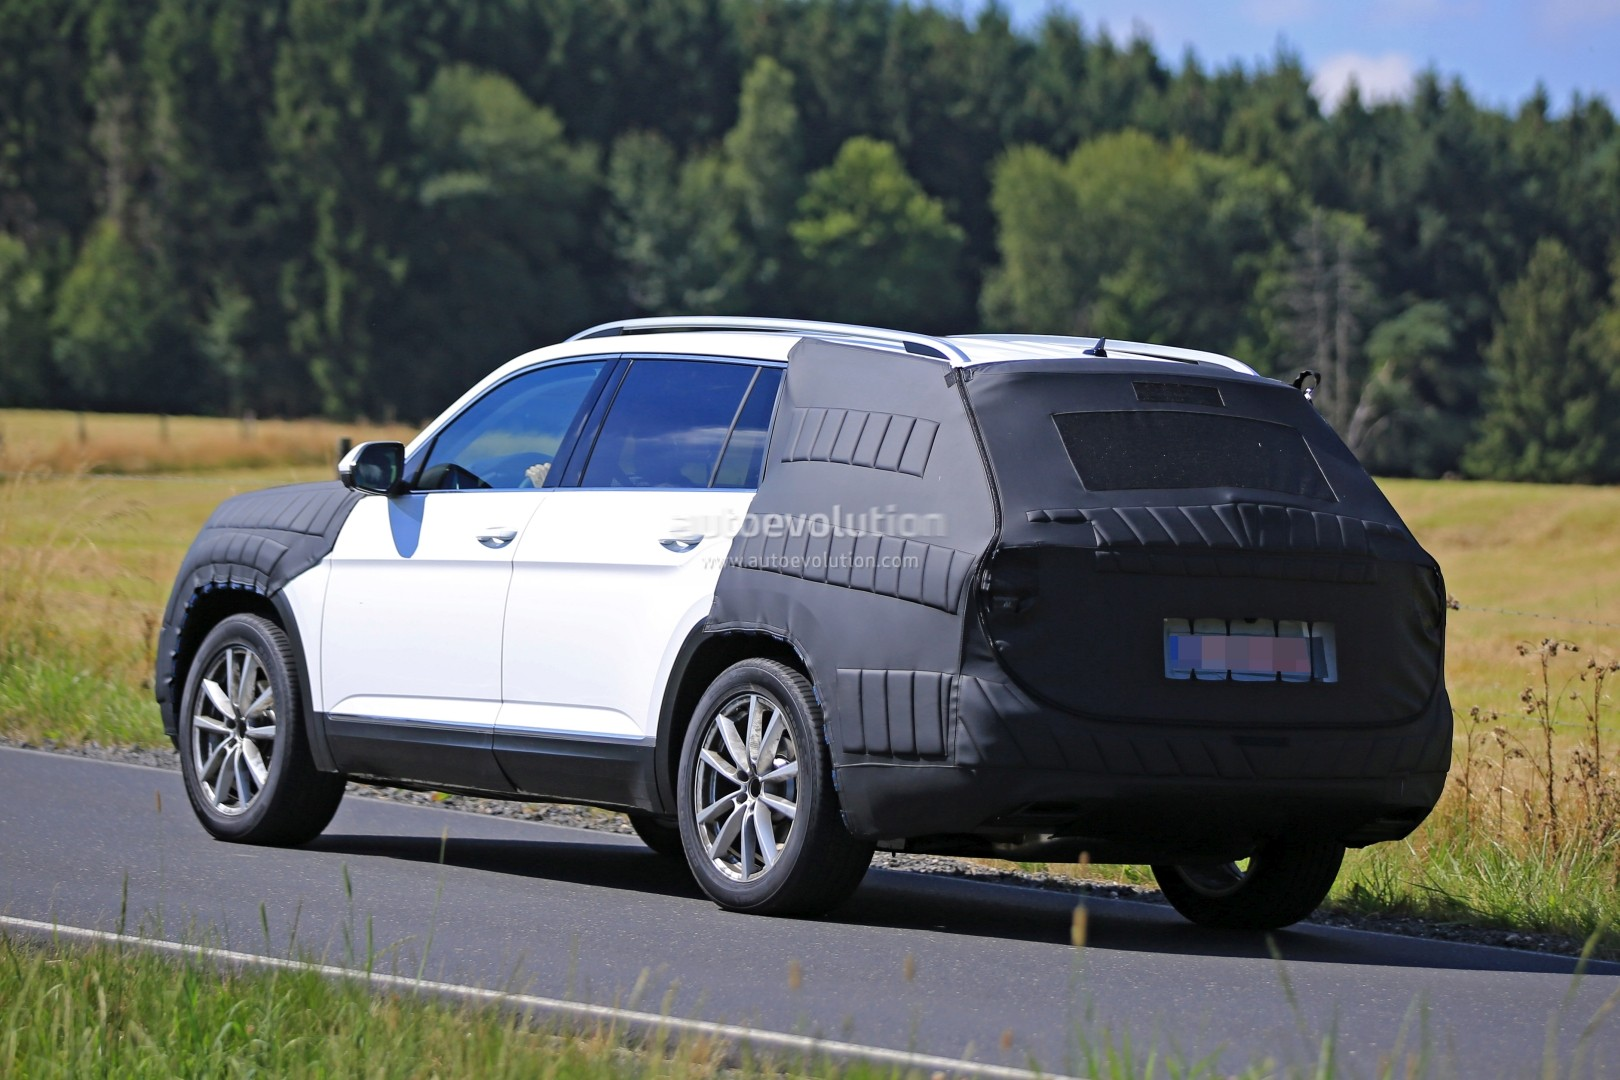 2017 Volkswagen 7-Seater US Market SUV Spied Testing Its ...